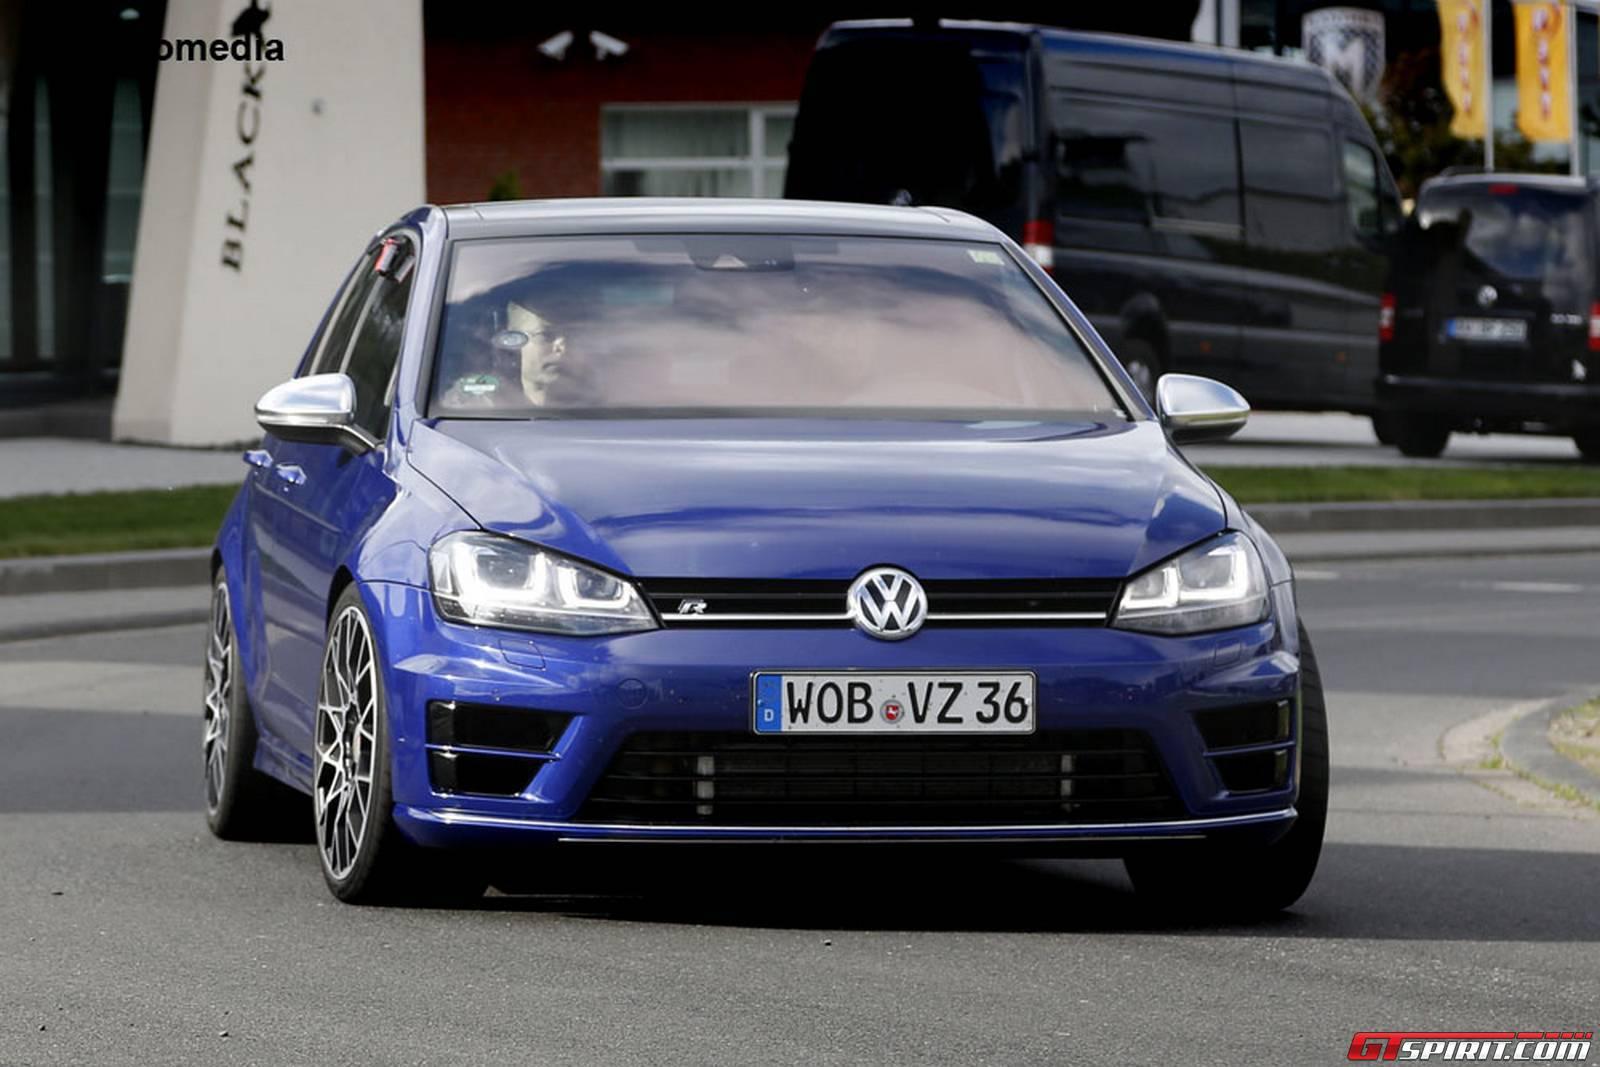 Vw Golf R400 >> Volkswagen Golf R400 Spied Testing At The Nurburgring Gtspirit